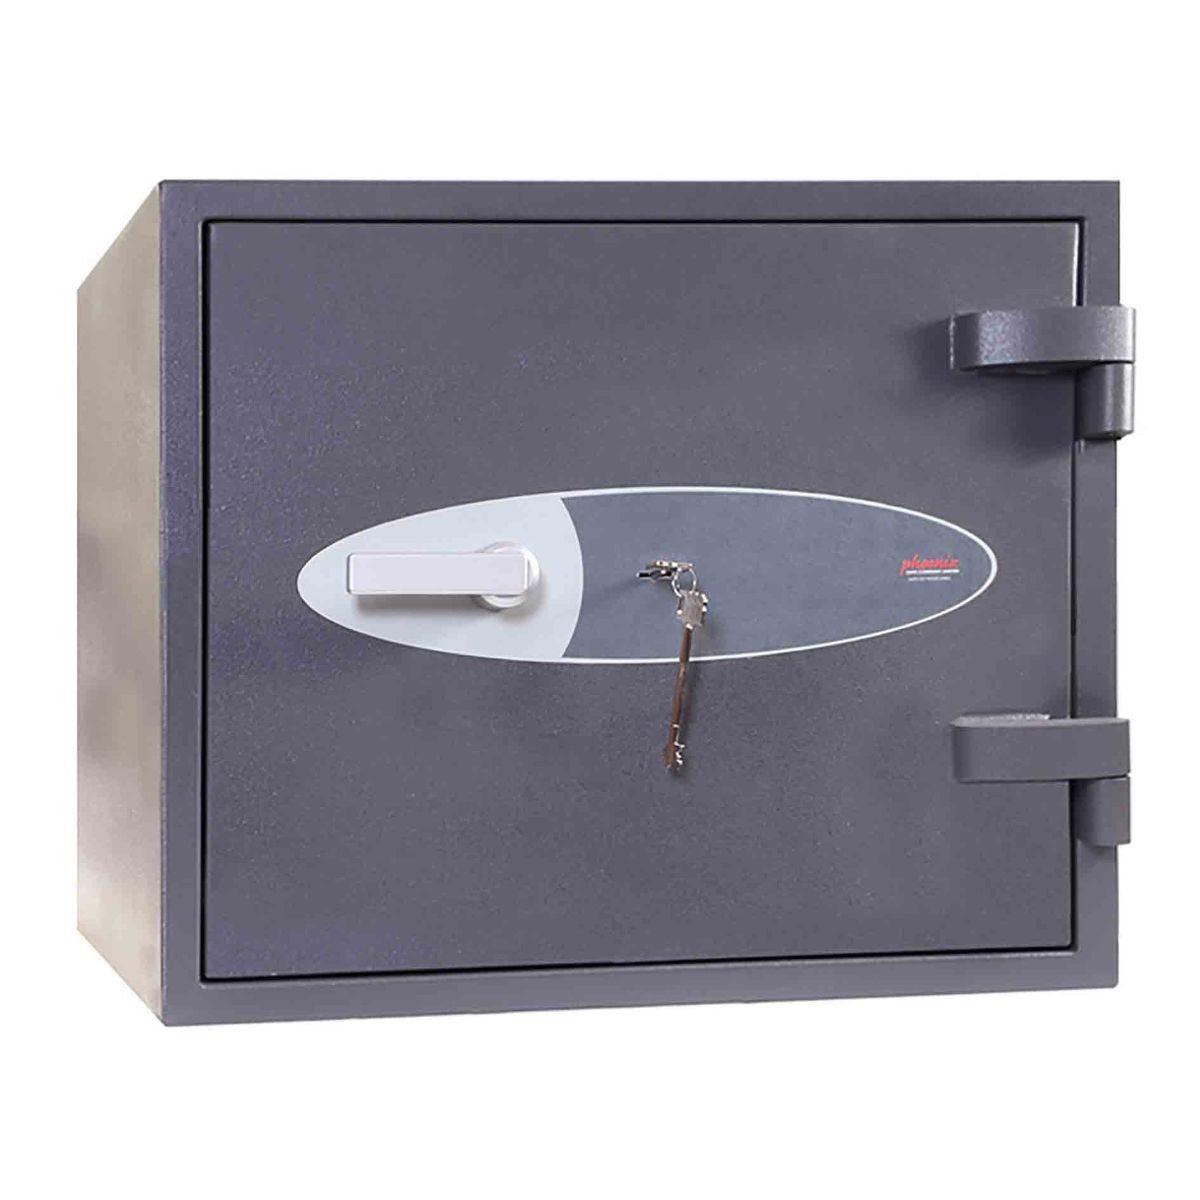 Phoenix Neptune HS1052K High Security Euro Grade 1 Safe with Key Lock Size 2